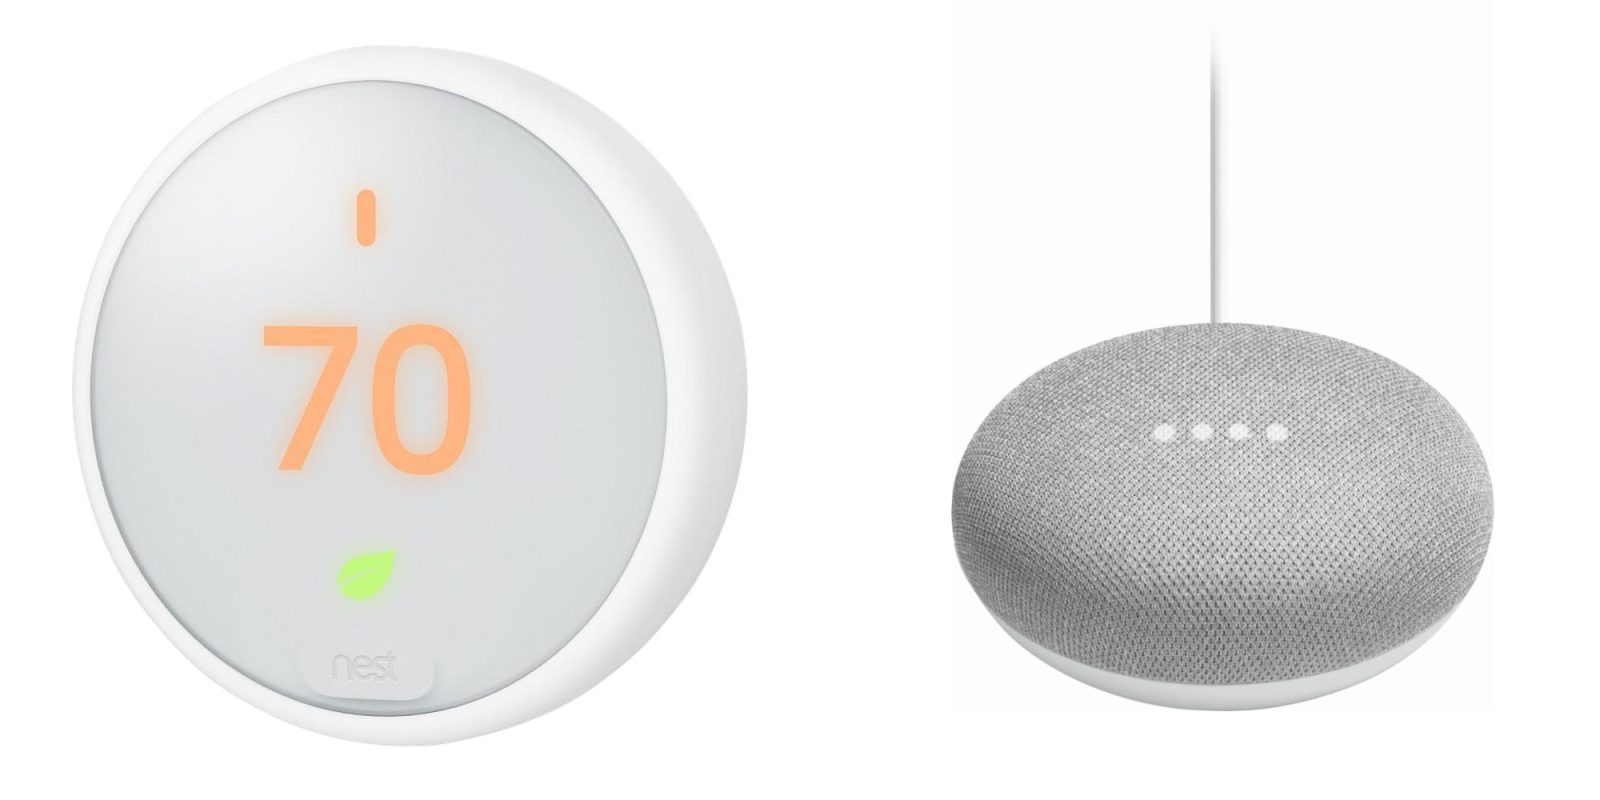 Nest E Smart Thermostats Are On Sale W A Bundled Google Home Mini 139 210 Value